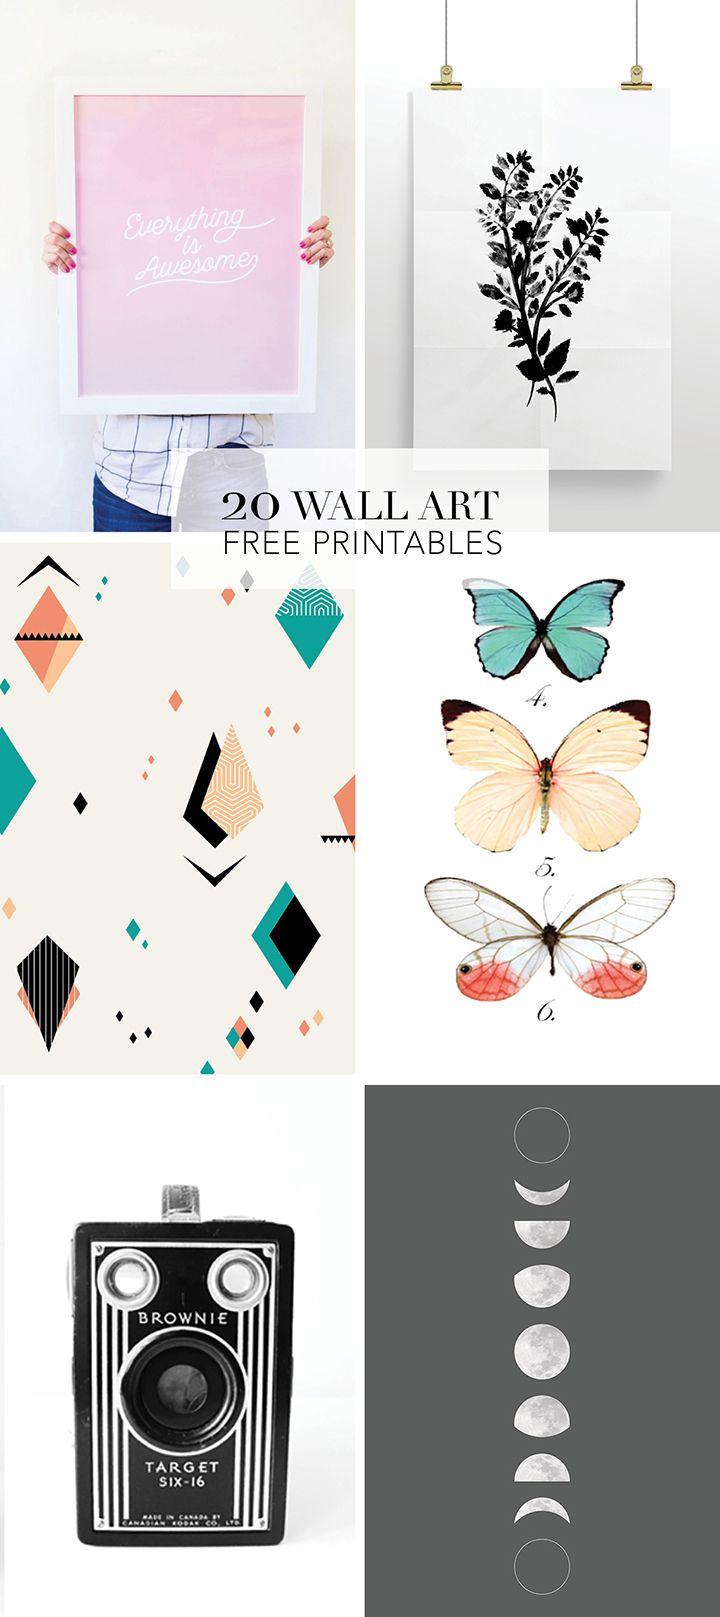 20 Favorite Wall Art Free Printables | DIY Wall decor | Diy wall art